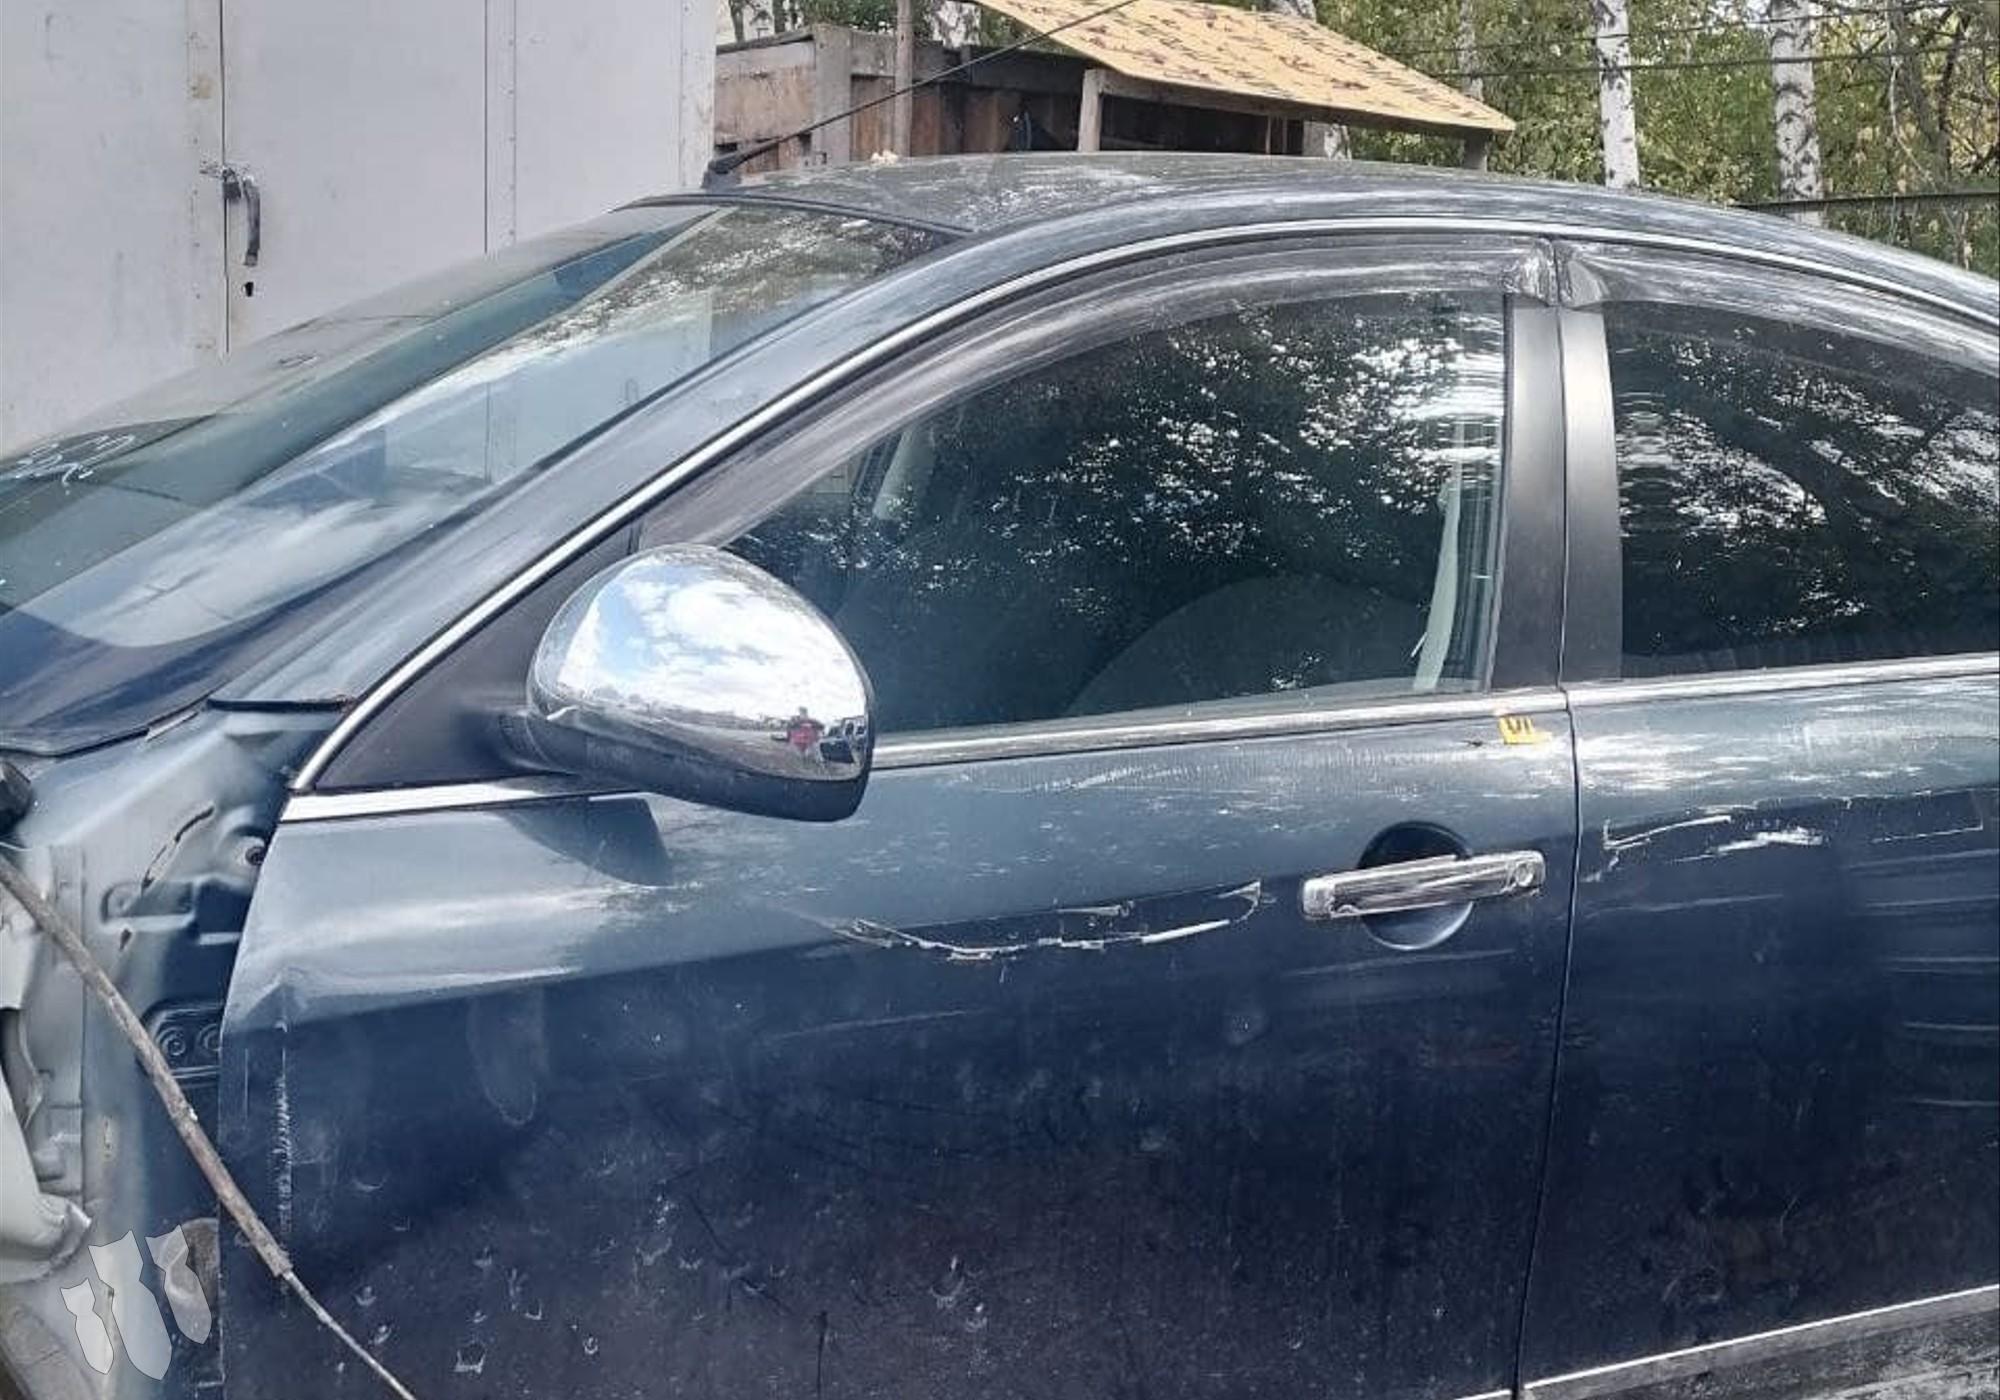 801014AA8B Дверь передняя левая для Nissan Almera III (с 2012 по 2018)